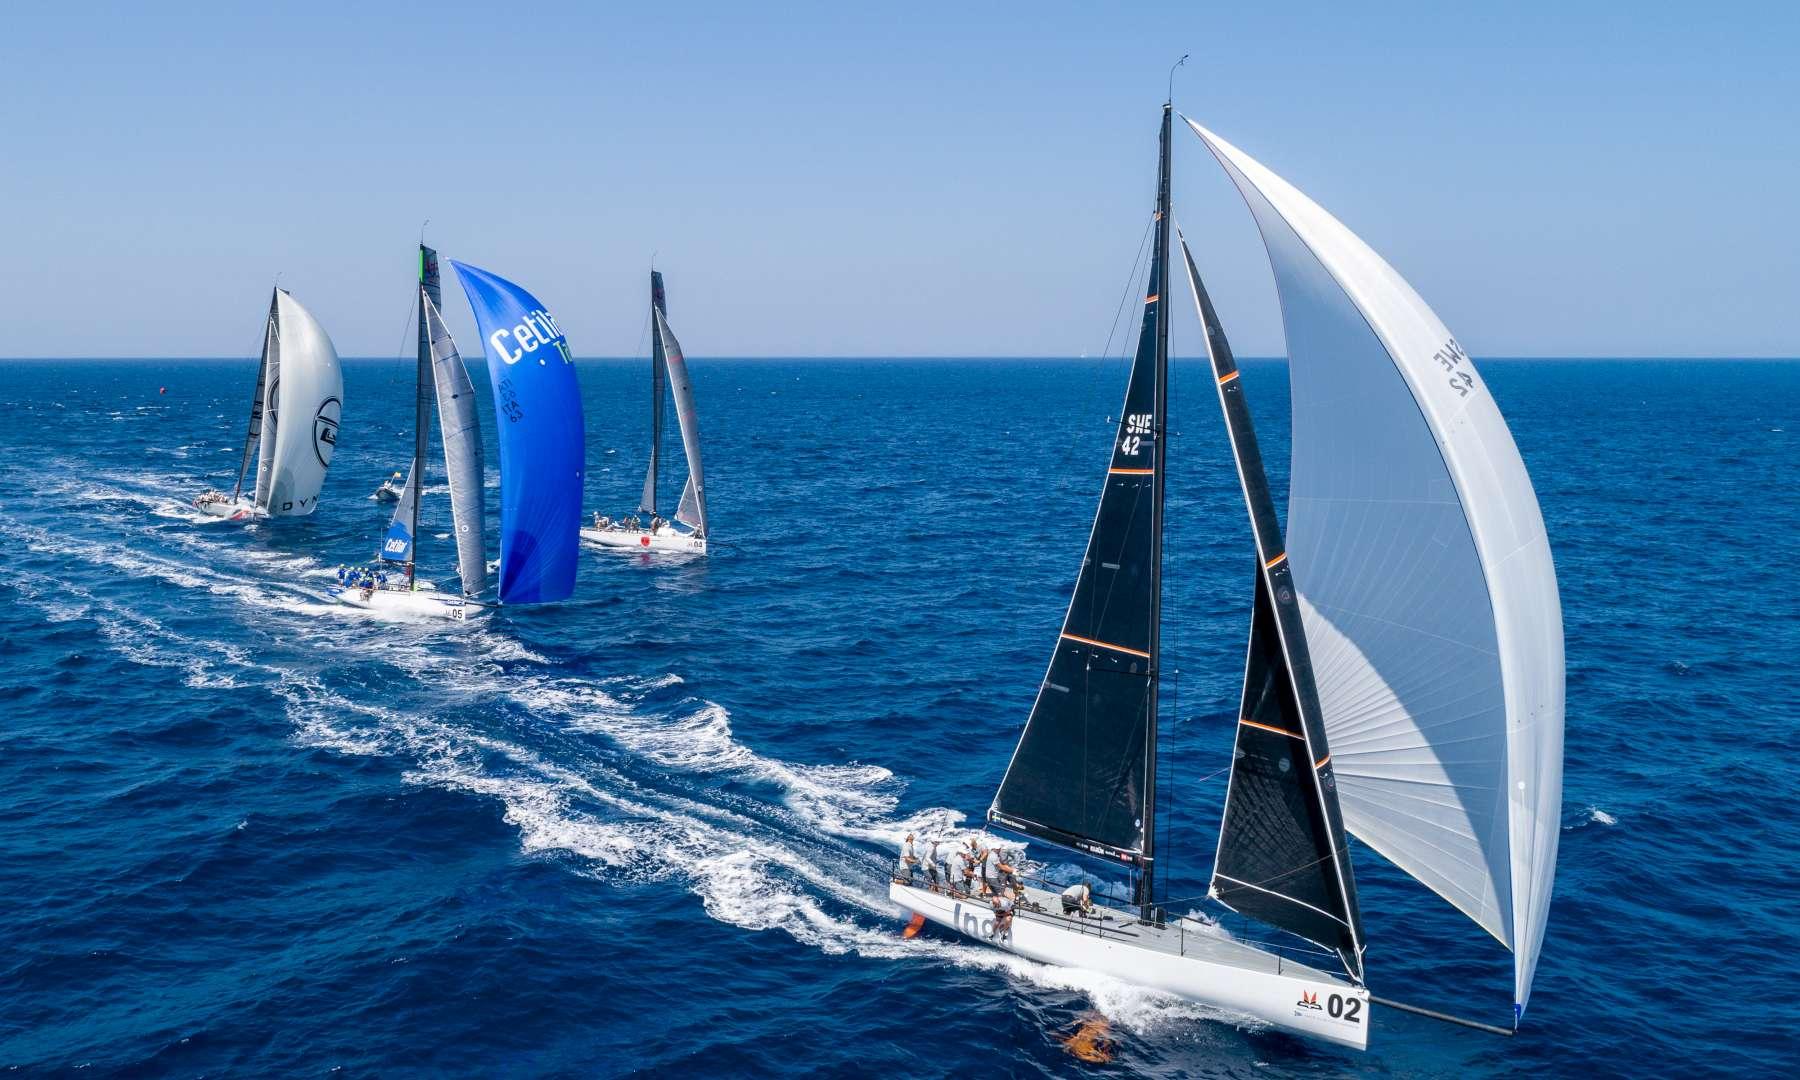 Inga wins the One Ocean Melges 40 Grand Prix - NEWS - Yacht Club Costa Smeralda